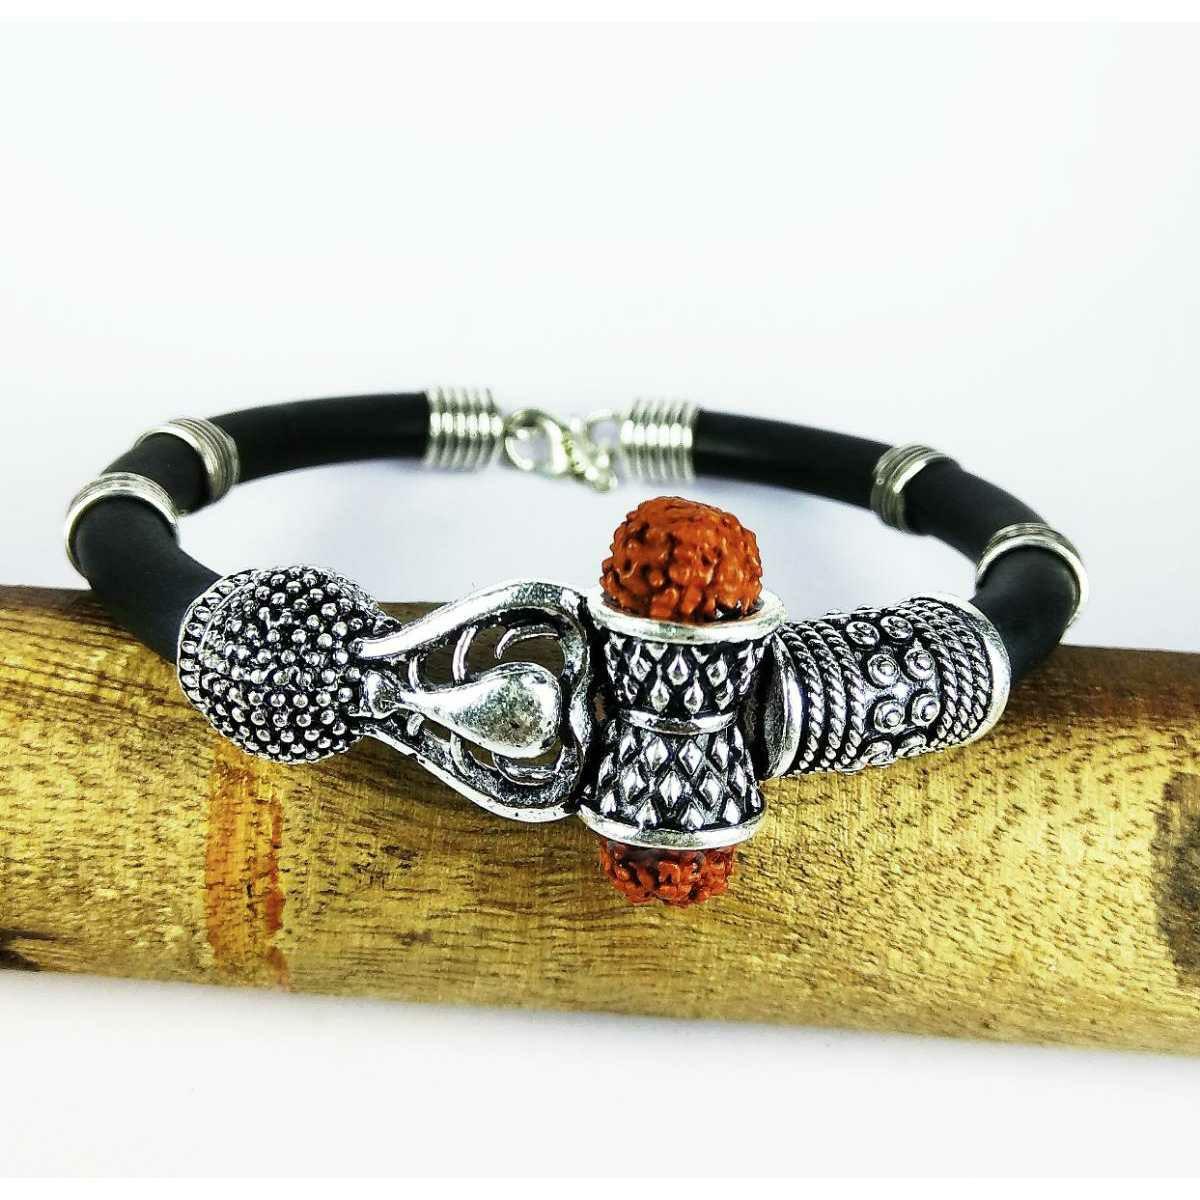 Expensive 925 Silver Black Leather Bahubali Gents Bracelet